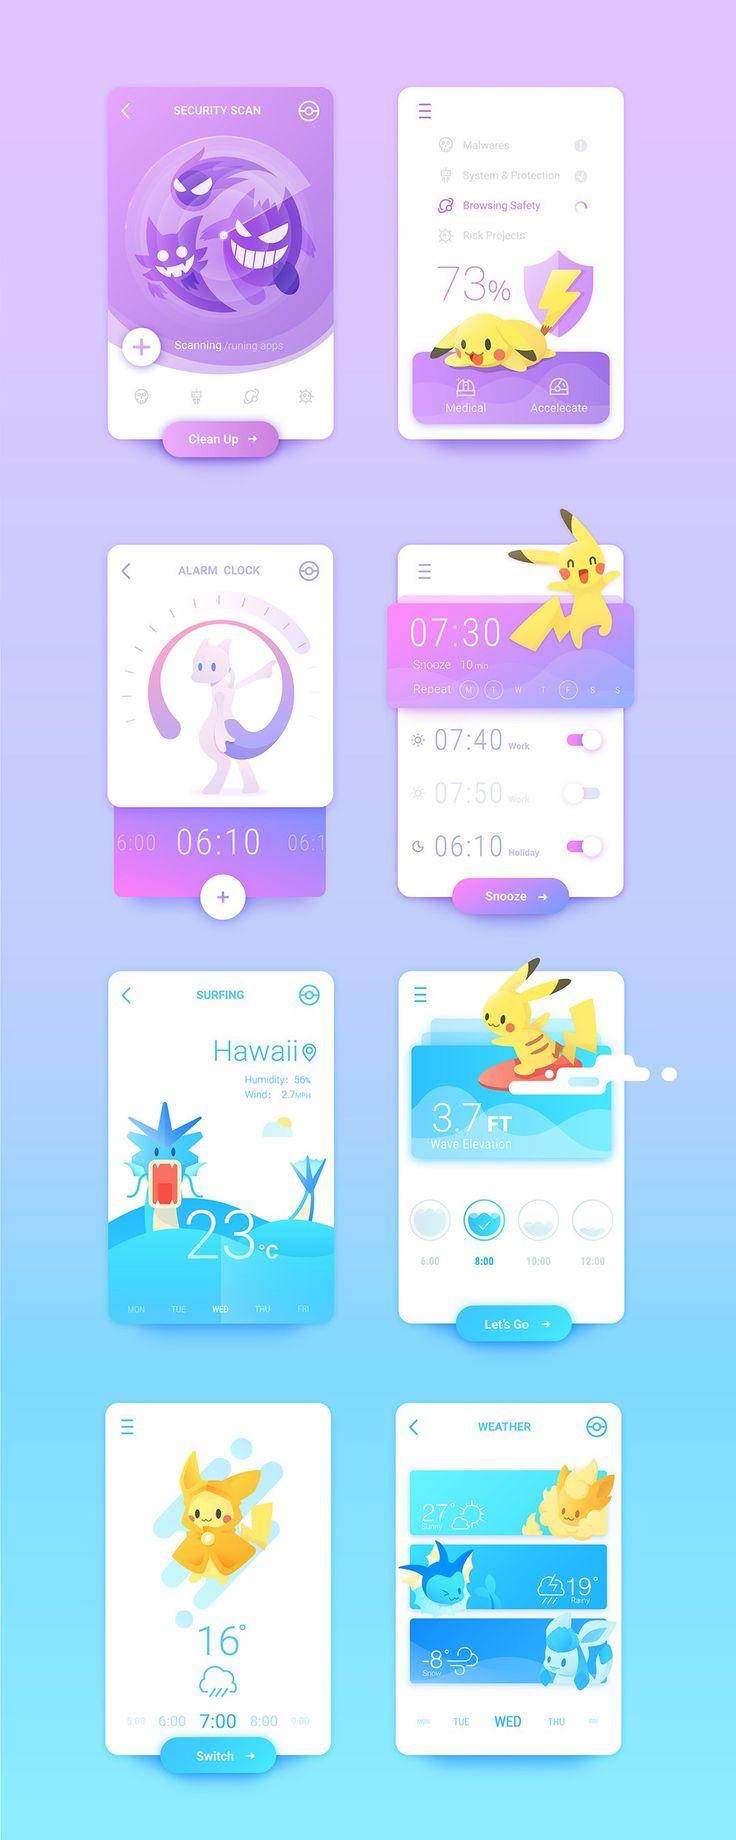 Animated scroll of Pokemom #App #Design #UI